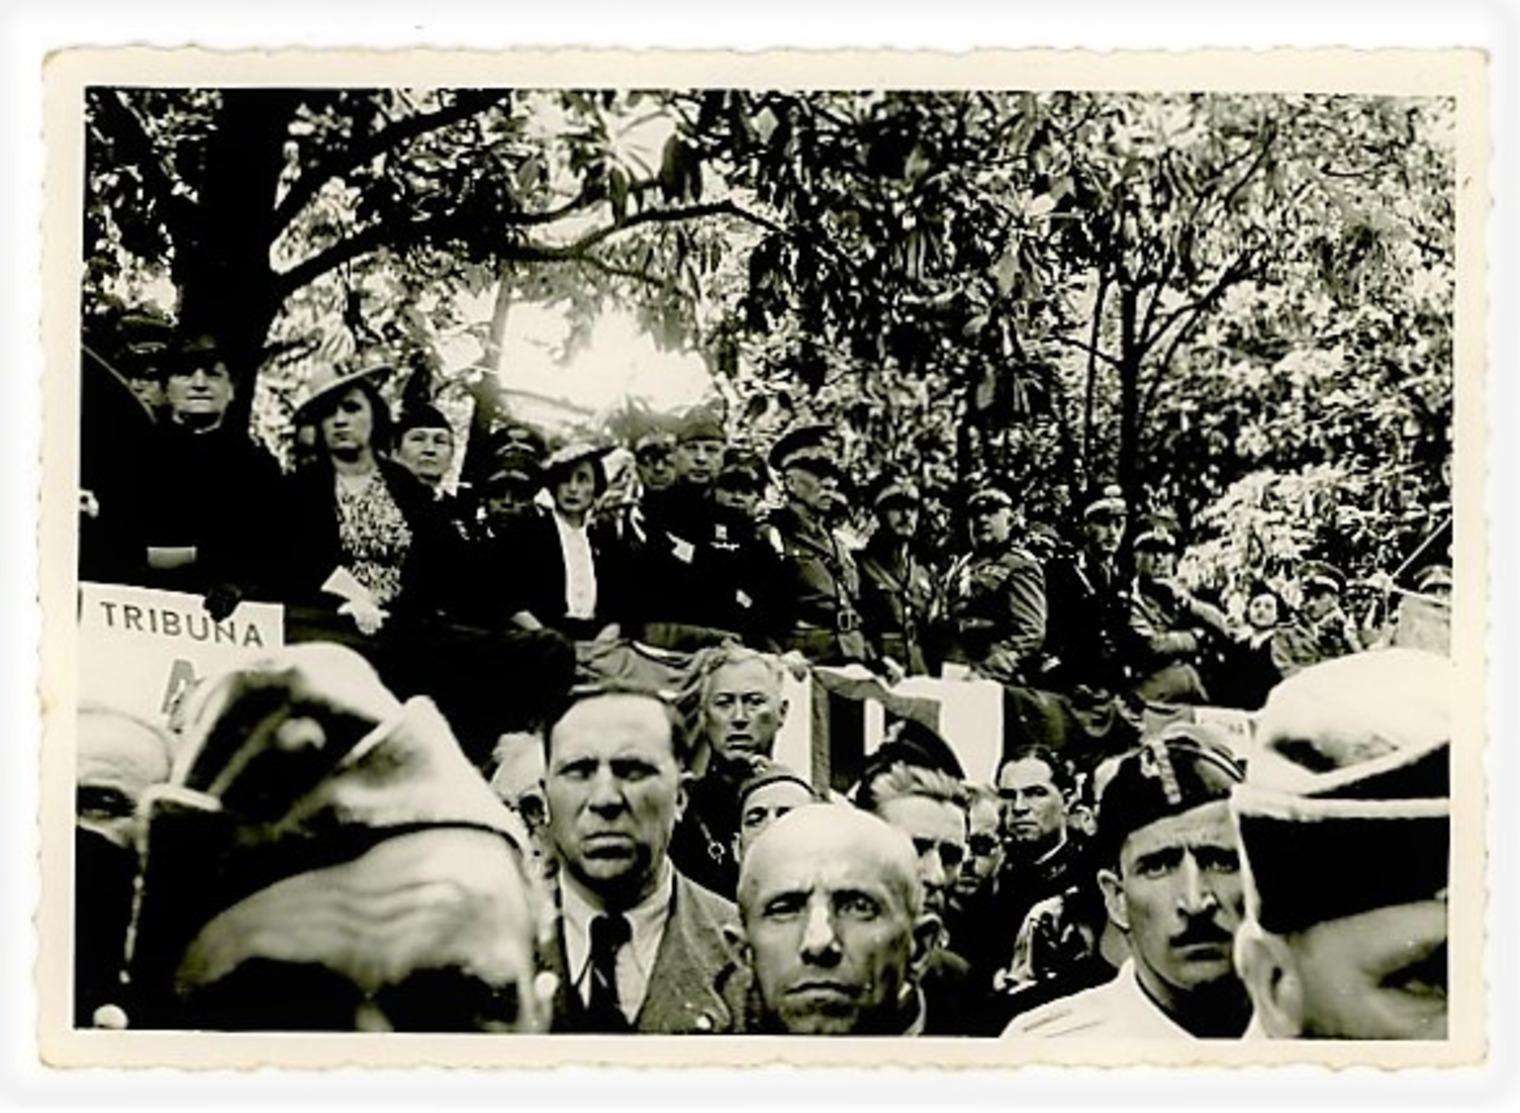 VENTENNIO - FOTO PALCO AUTORITA' 1939  – CHIAVARI FOTO MIGONE – (4/43) - Manifestations